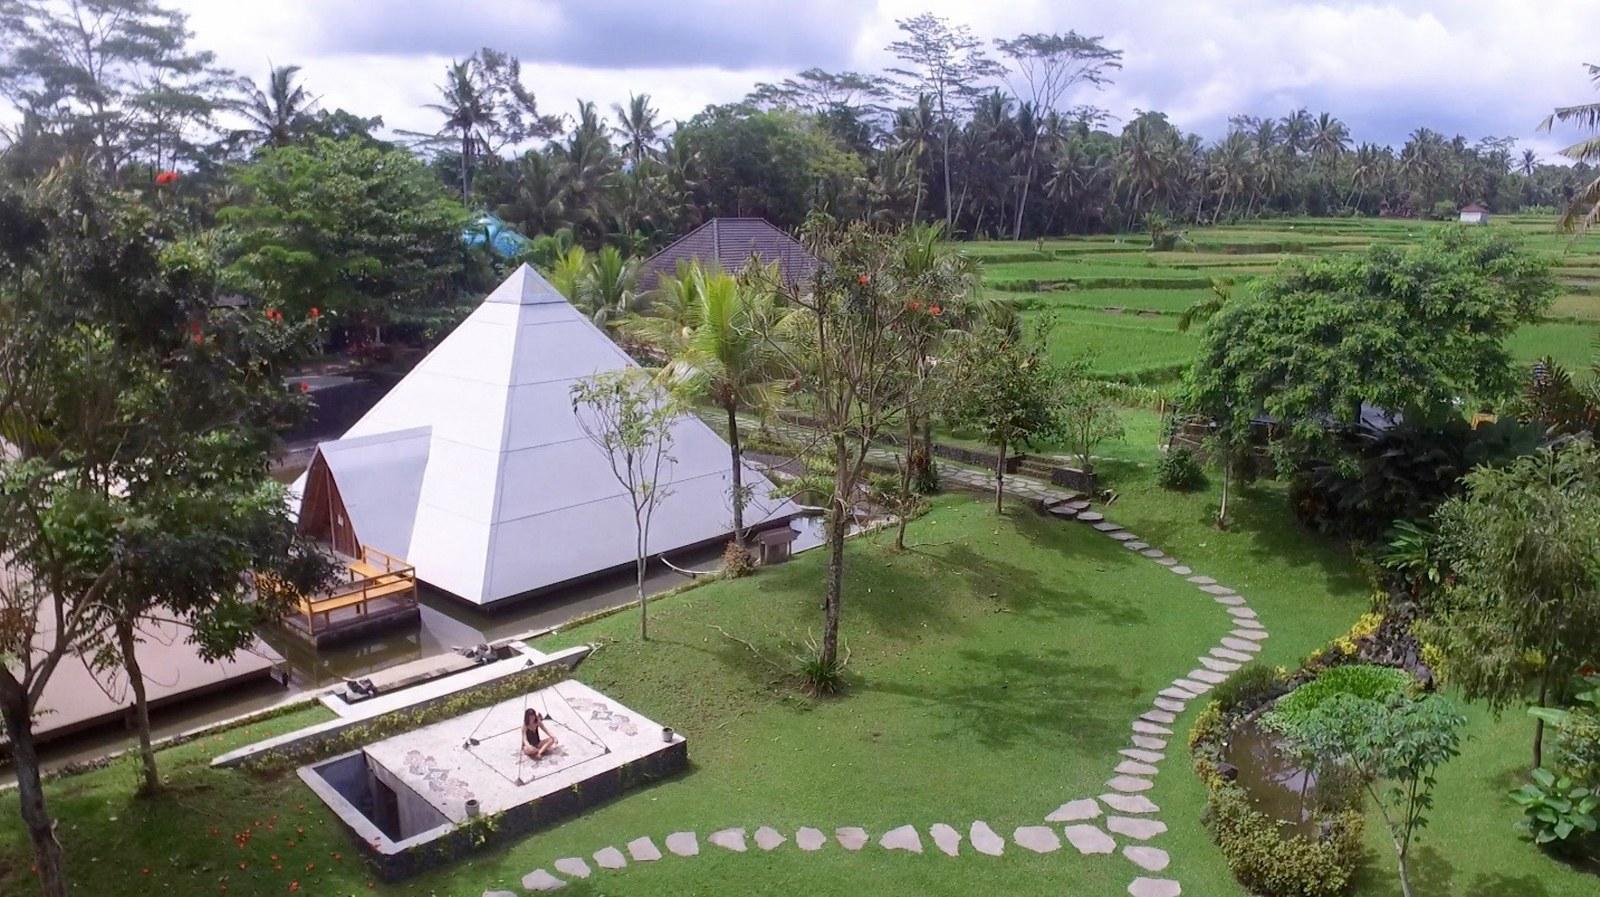 Pyramids-of-Chi_2_1600_897